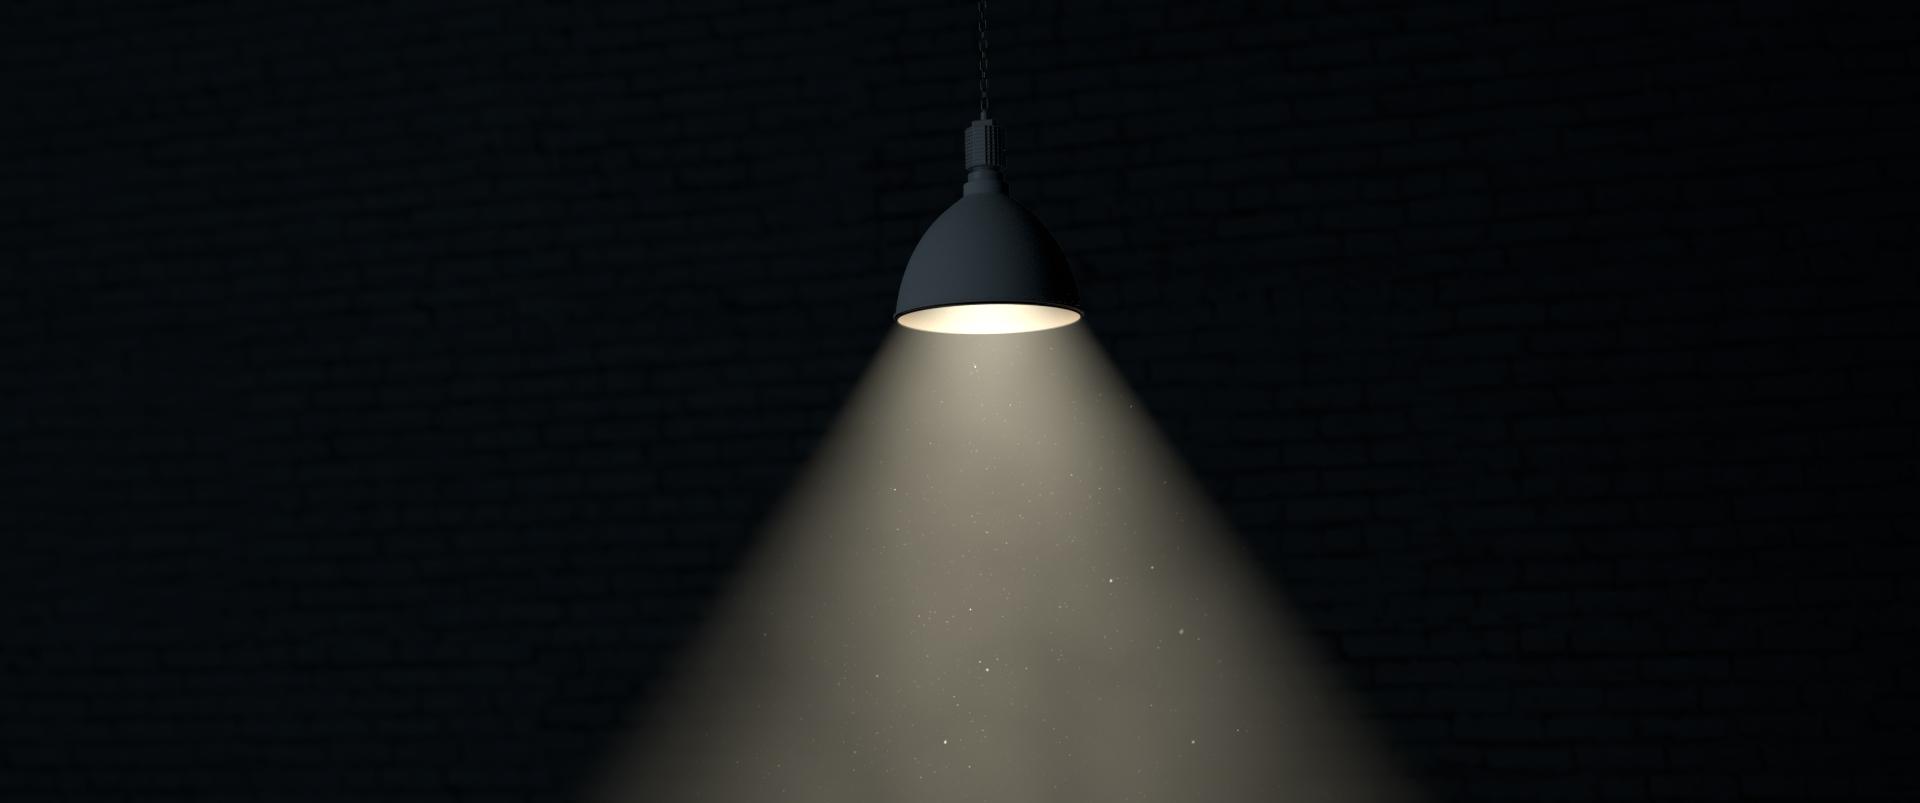 نورپردازی حجمی